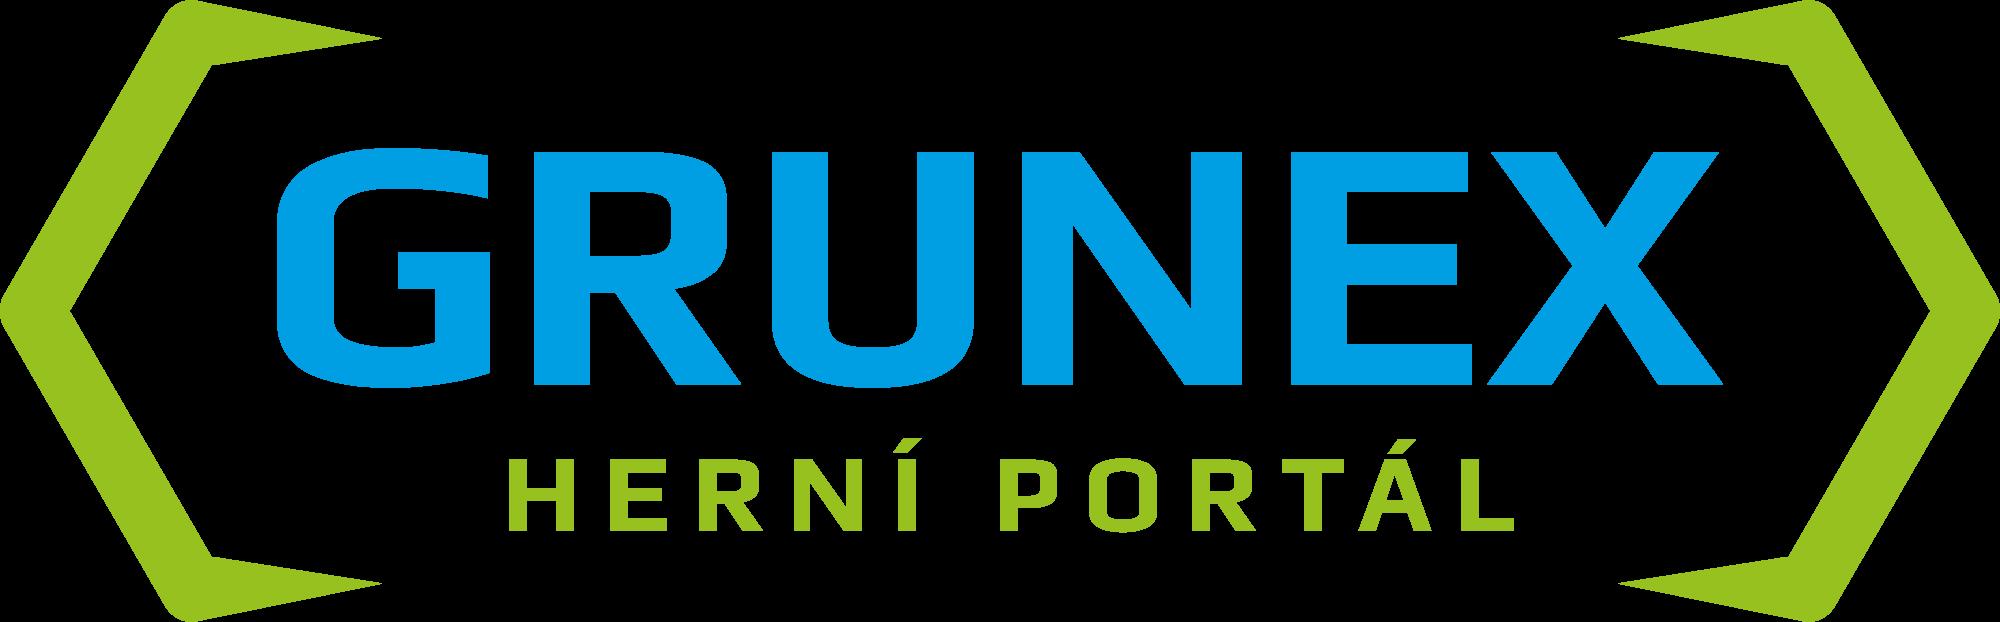 www.grunex.com